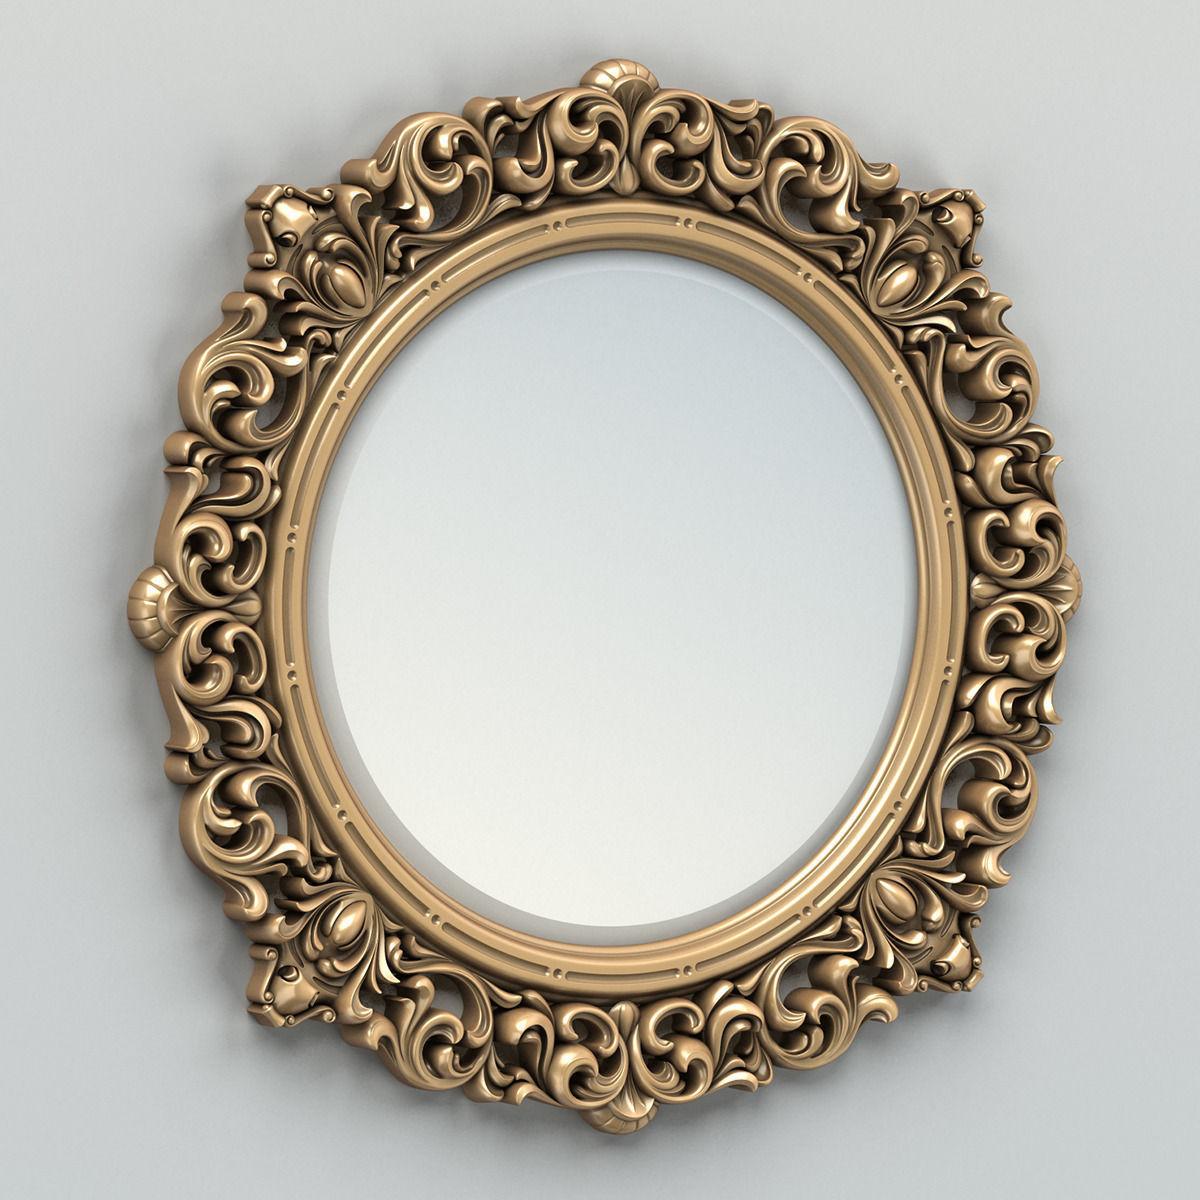 Round Mirror Frame 001 3d Model Max Obj Mtl Fbx Stl 1